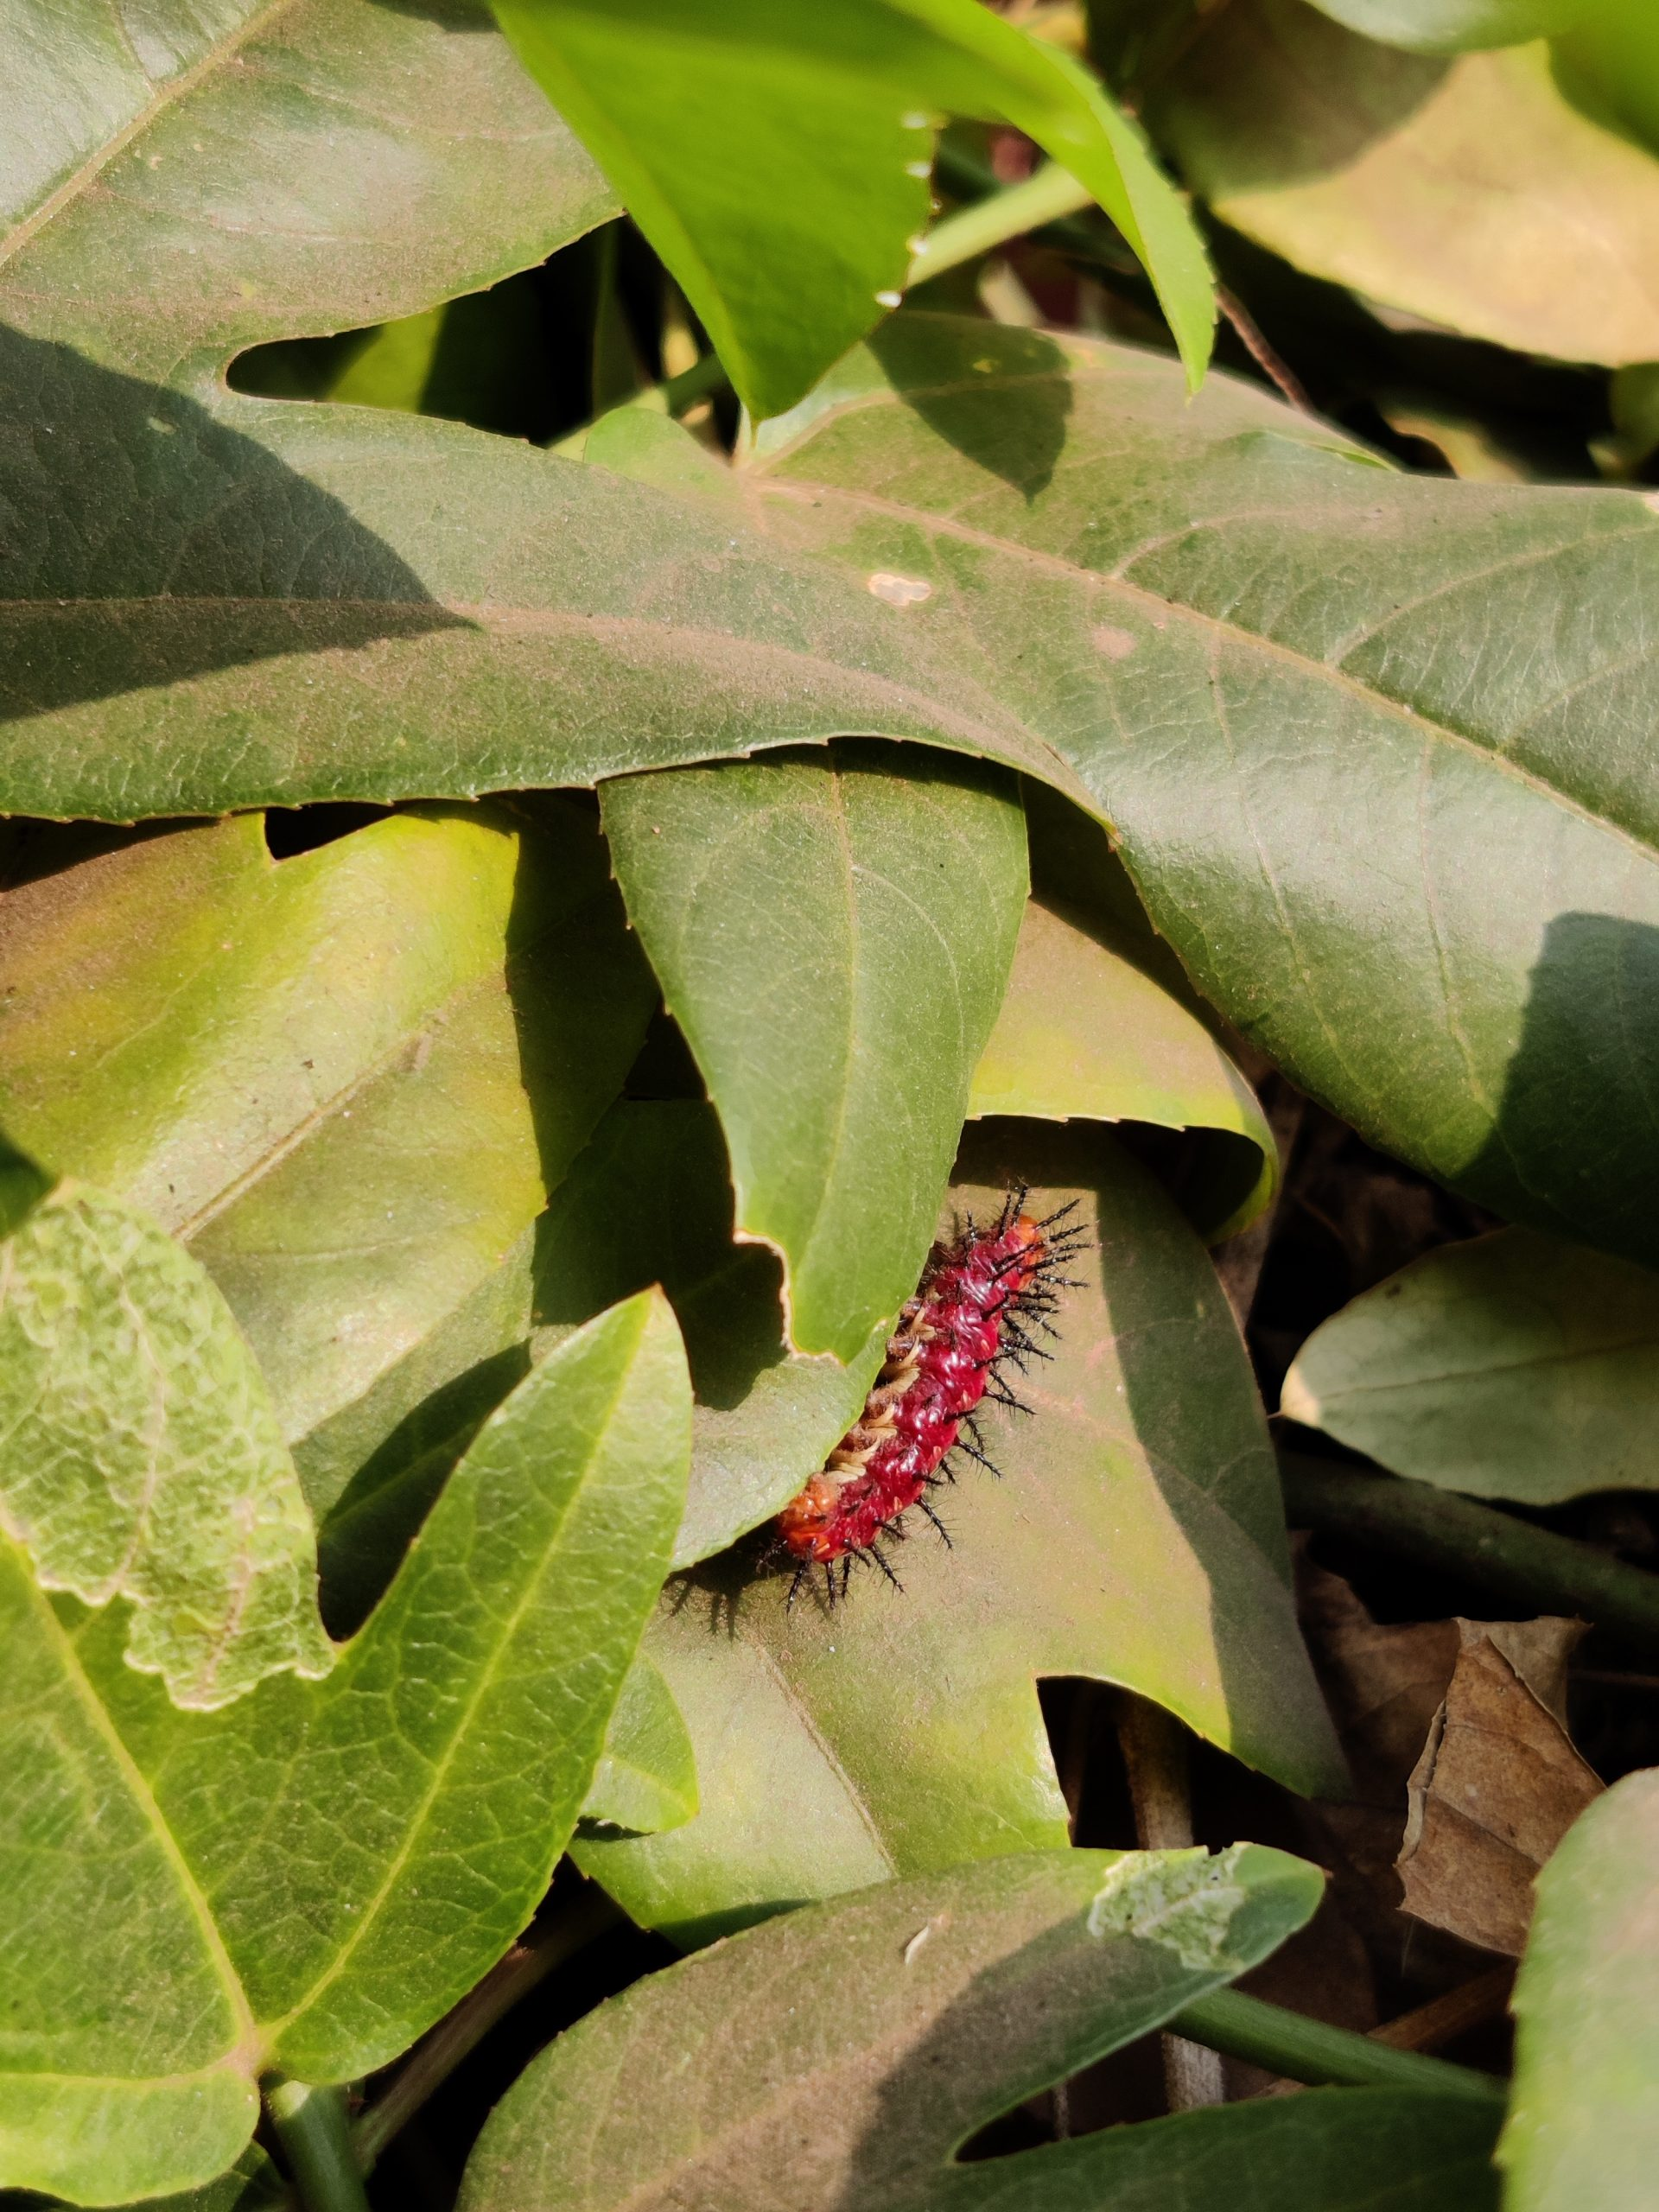 Caterpillar in leaves